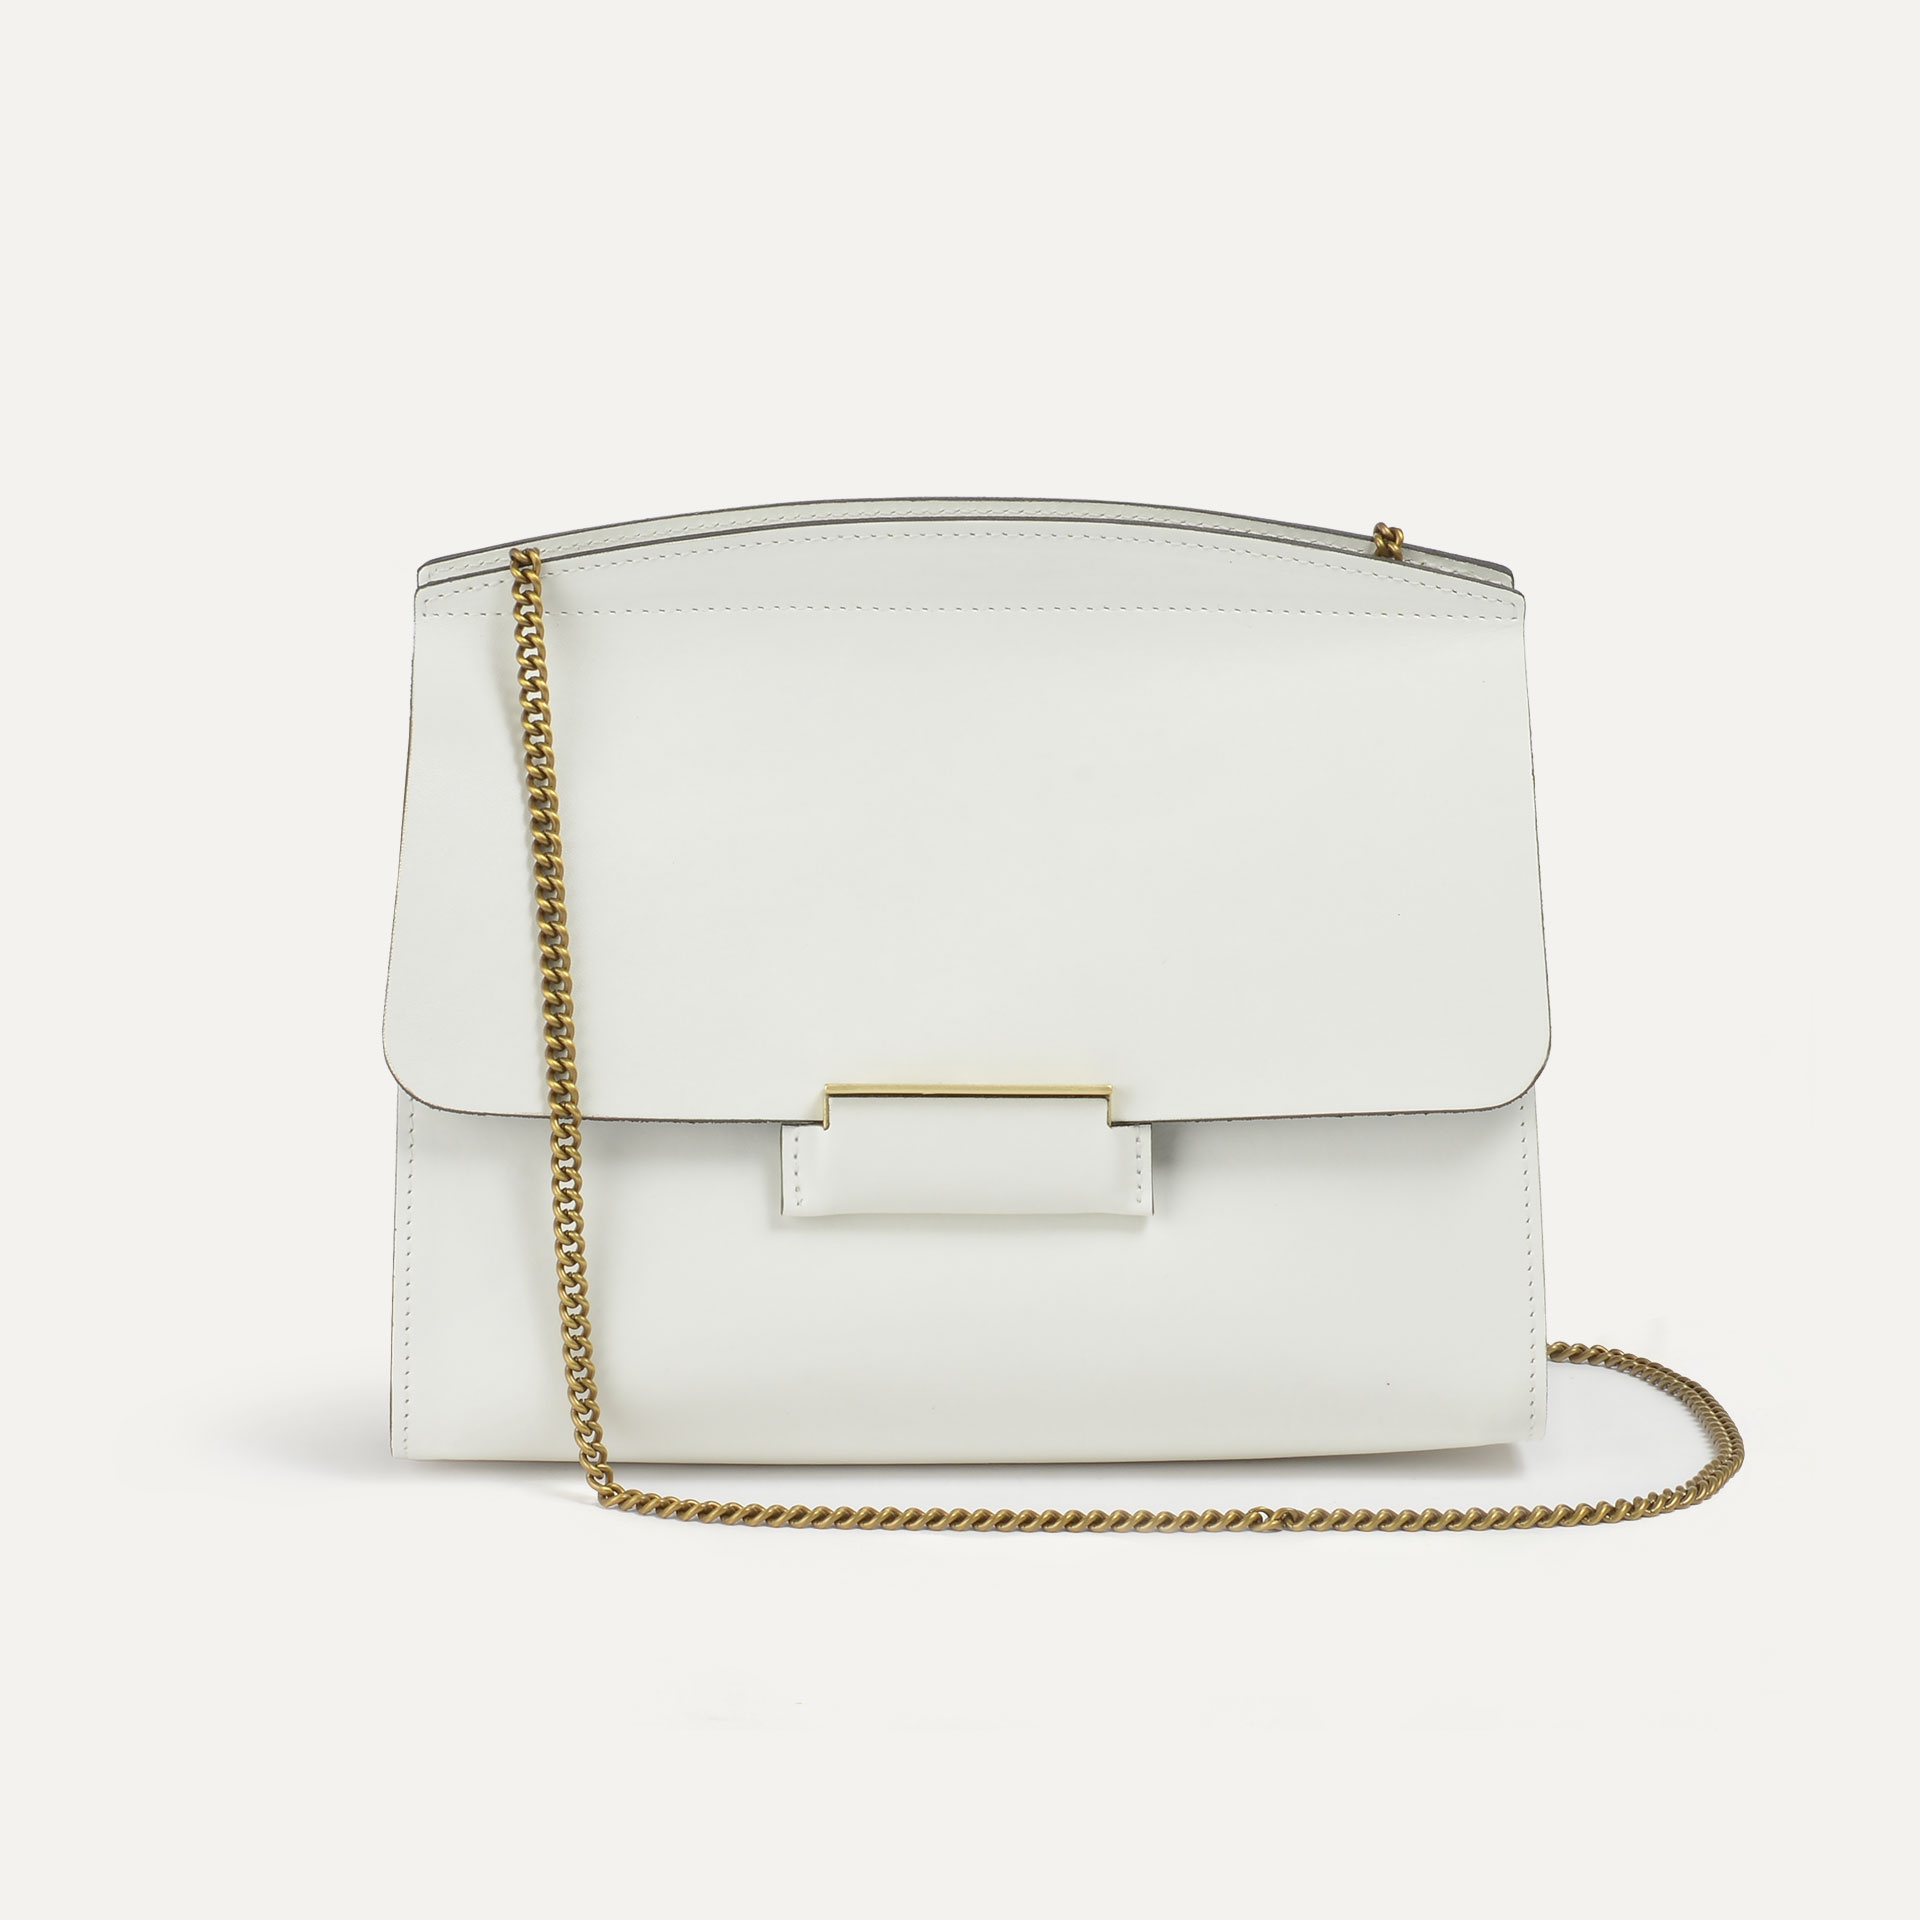 Origami S clutch bag - White (image n°2)